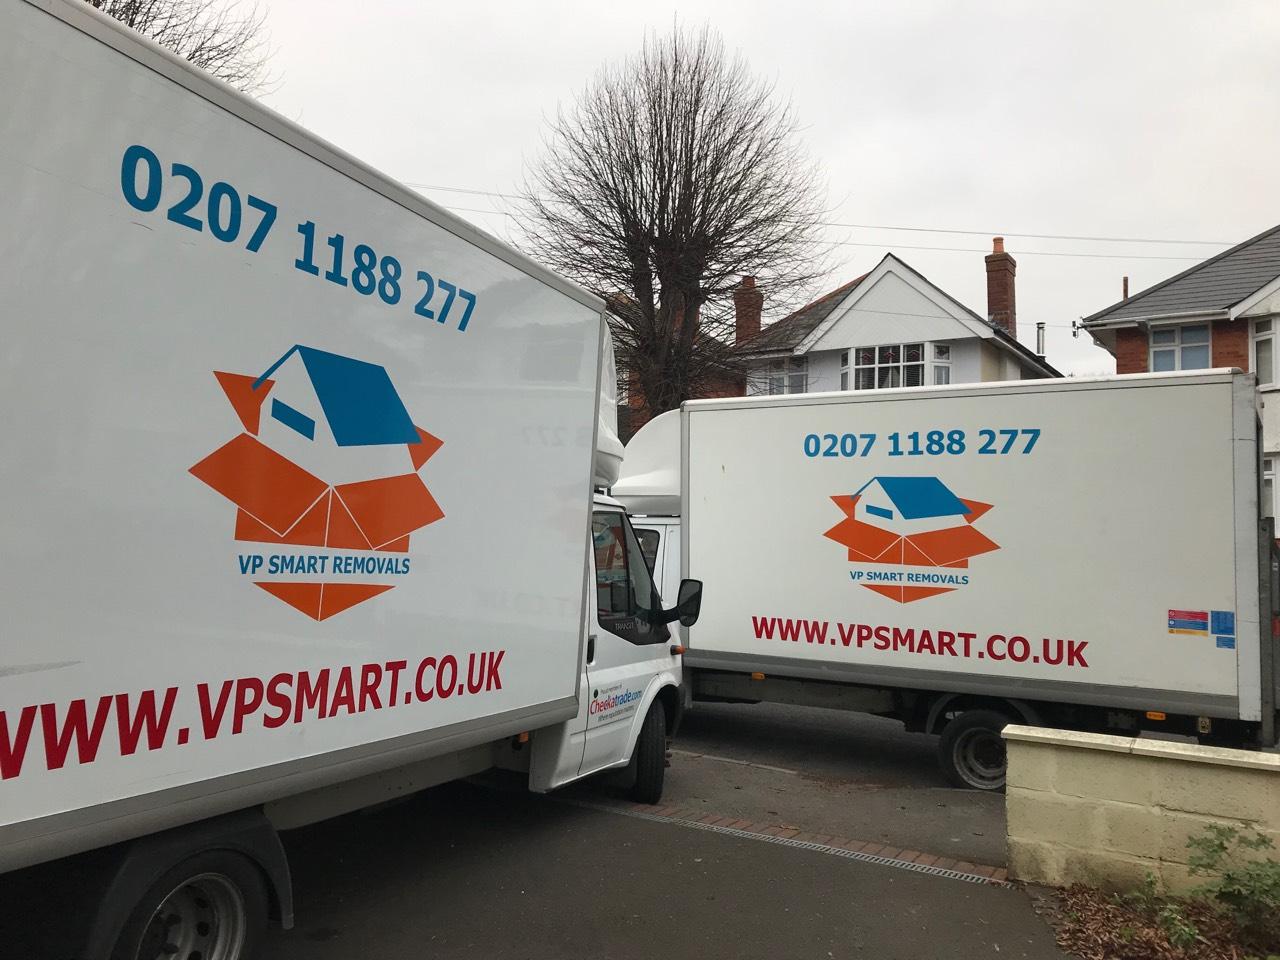 vpsmart.co.uk